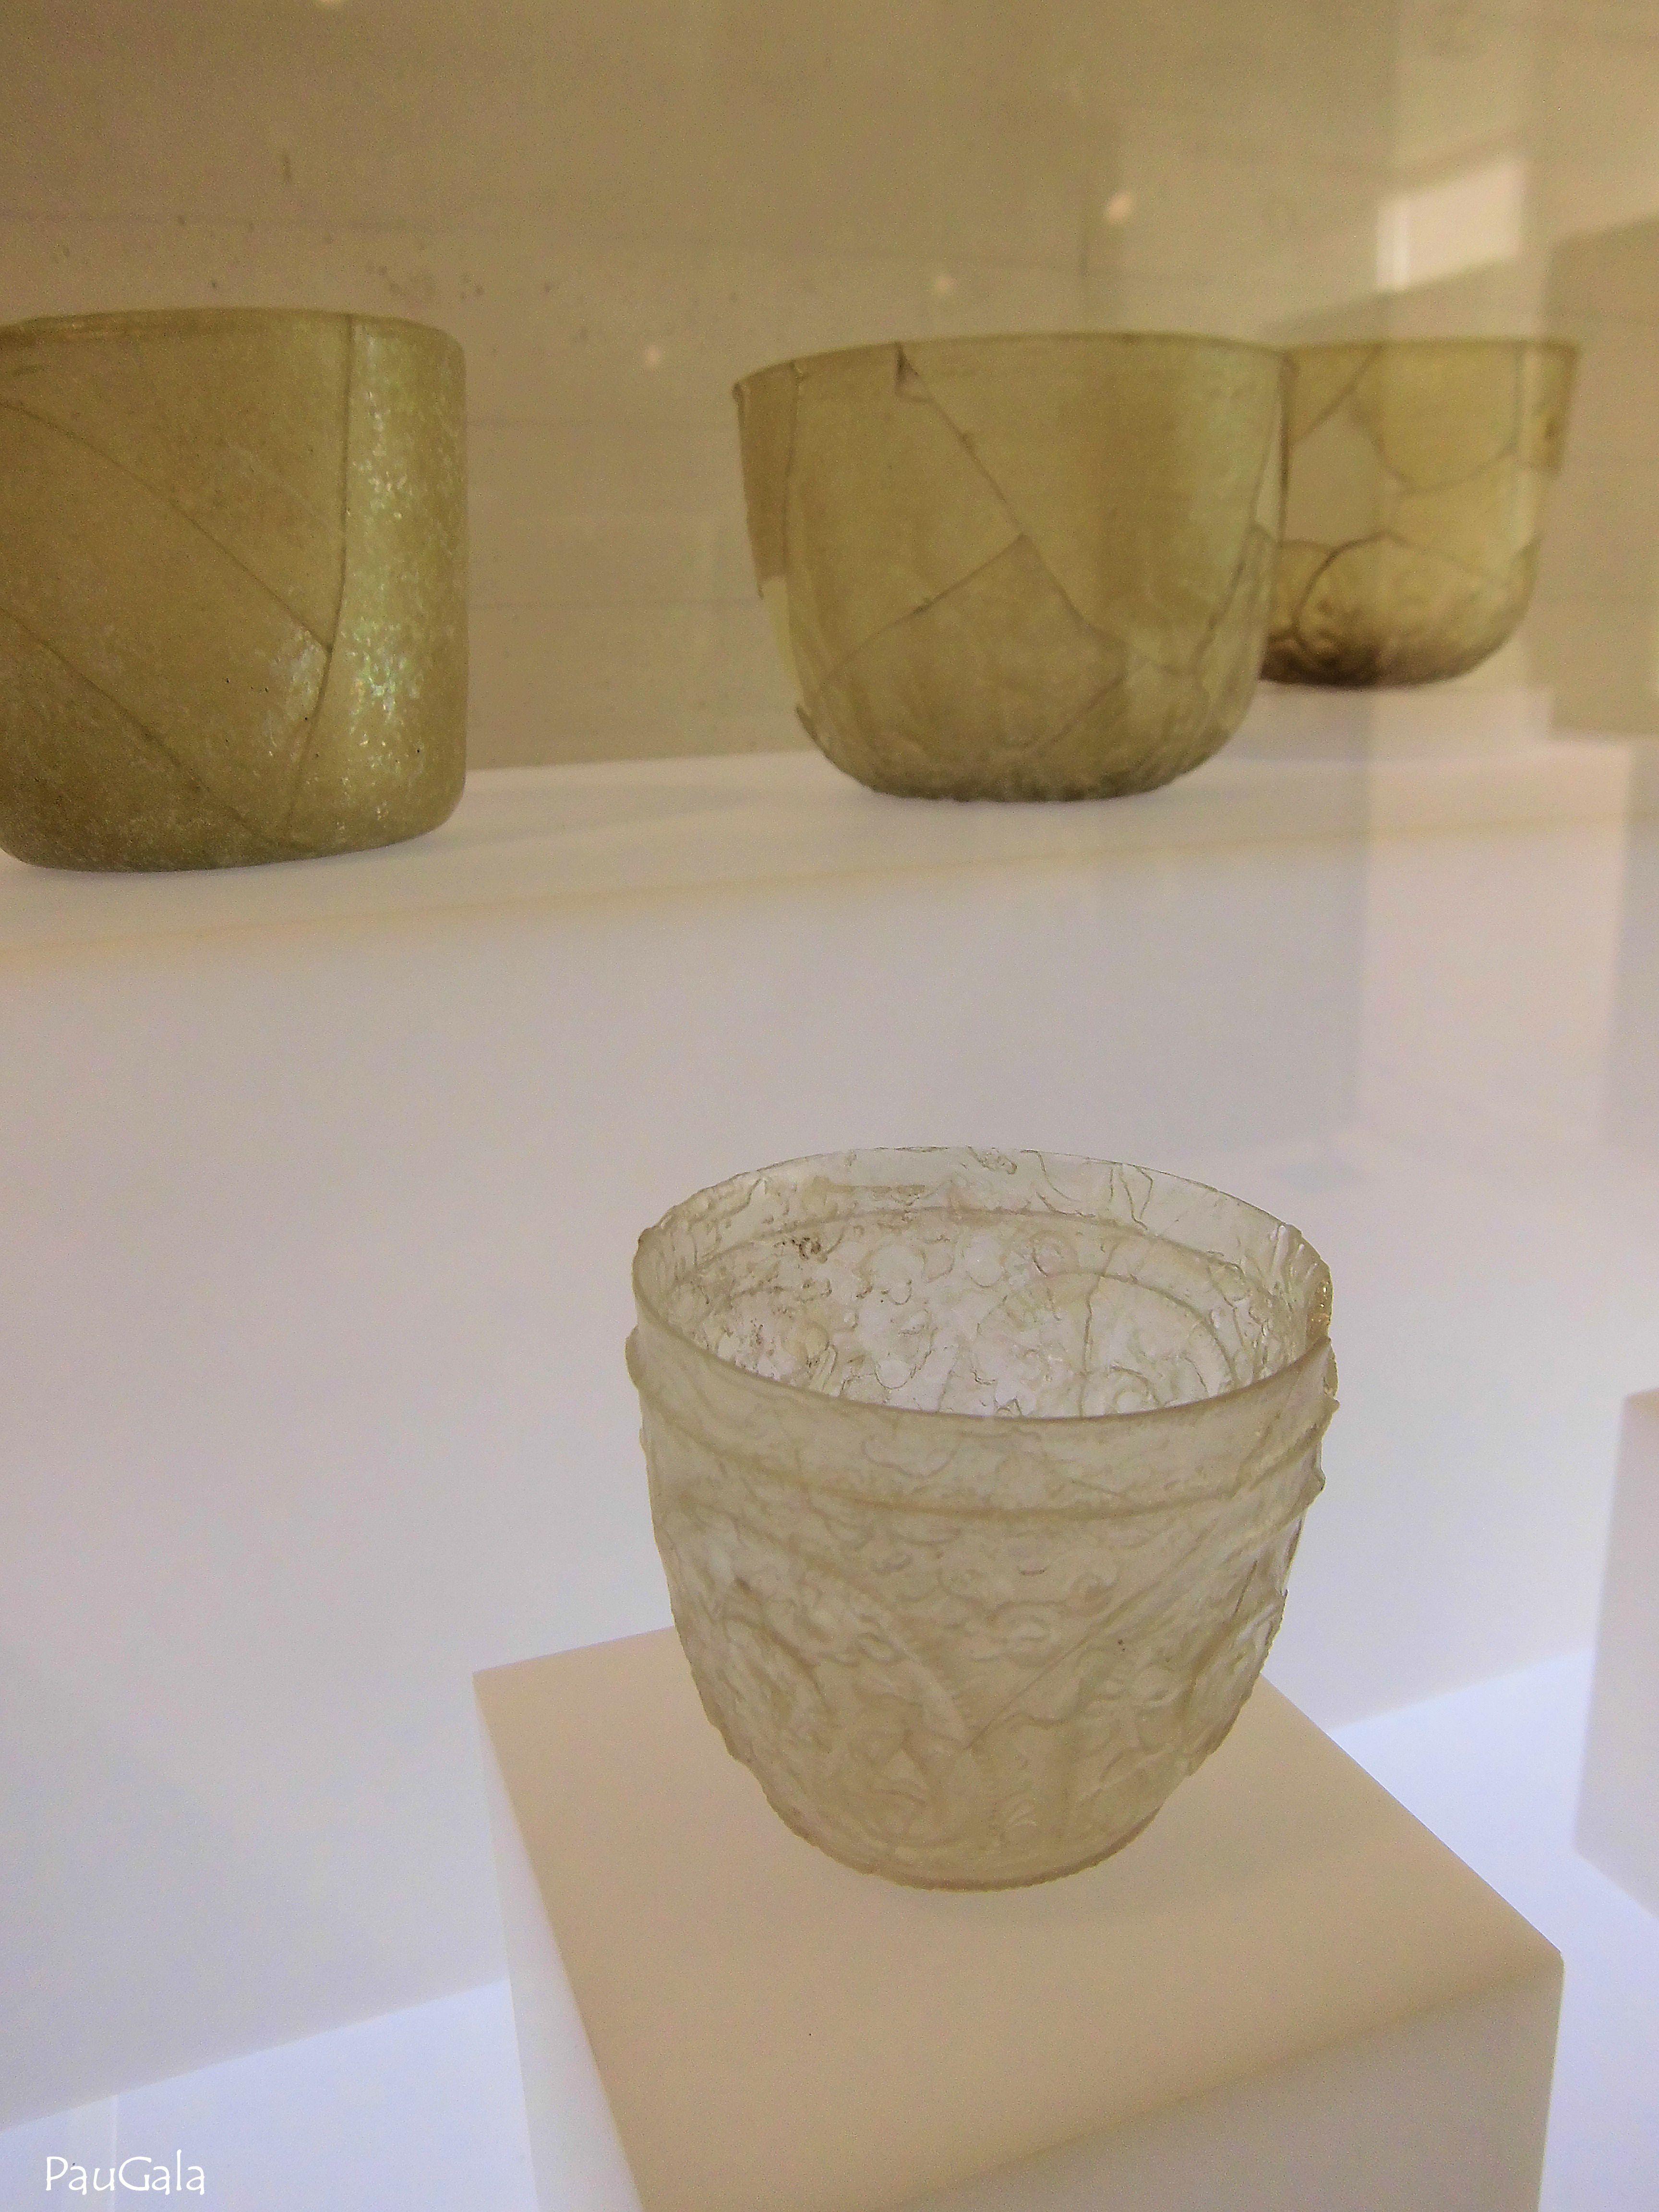 Vaso. Vidrio soplado y tallado. Siglo X. Madinat al-Zahra. Medina Azahara. Córdoba